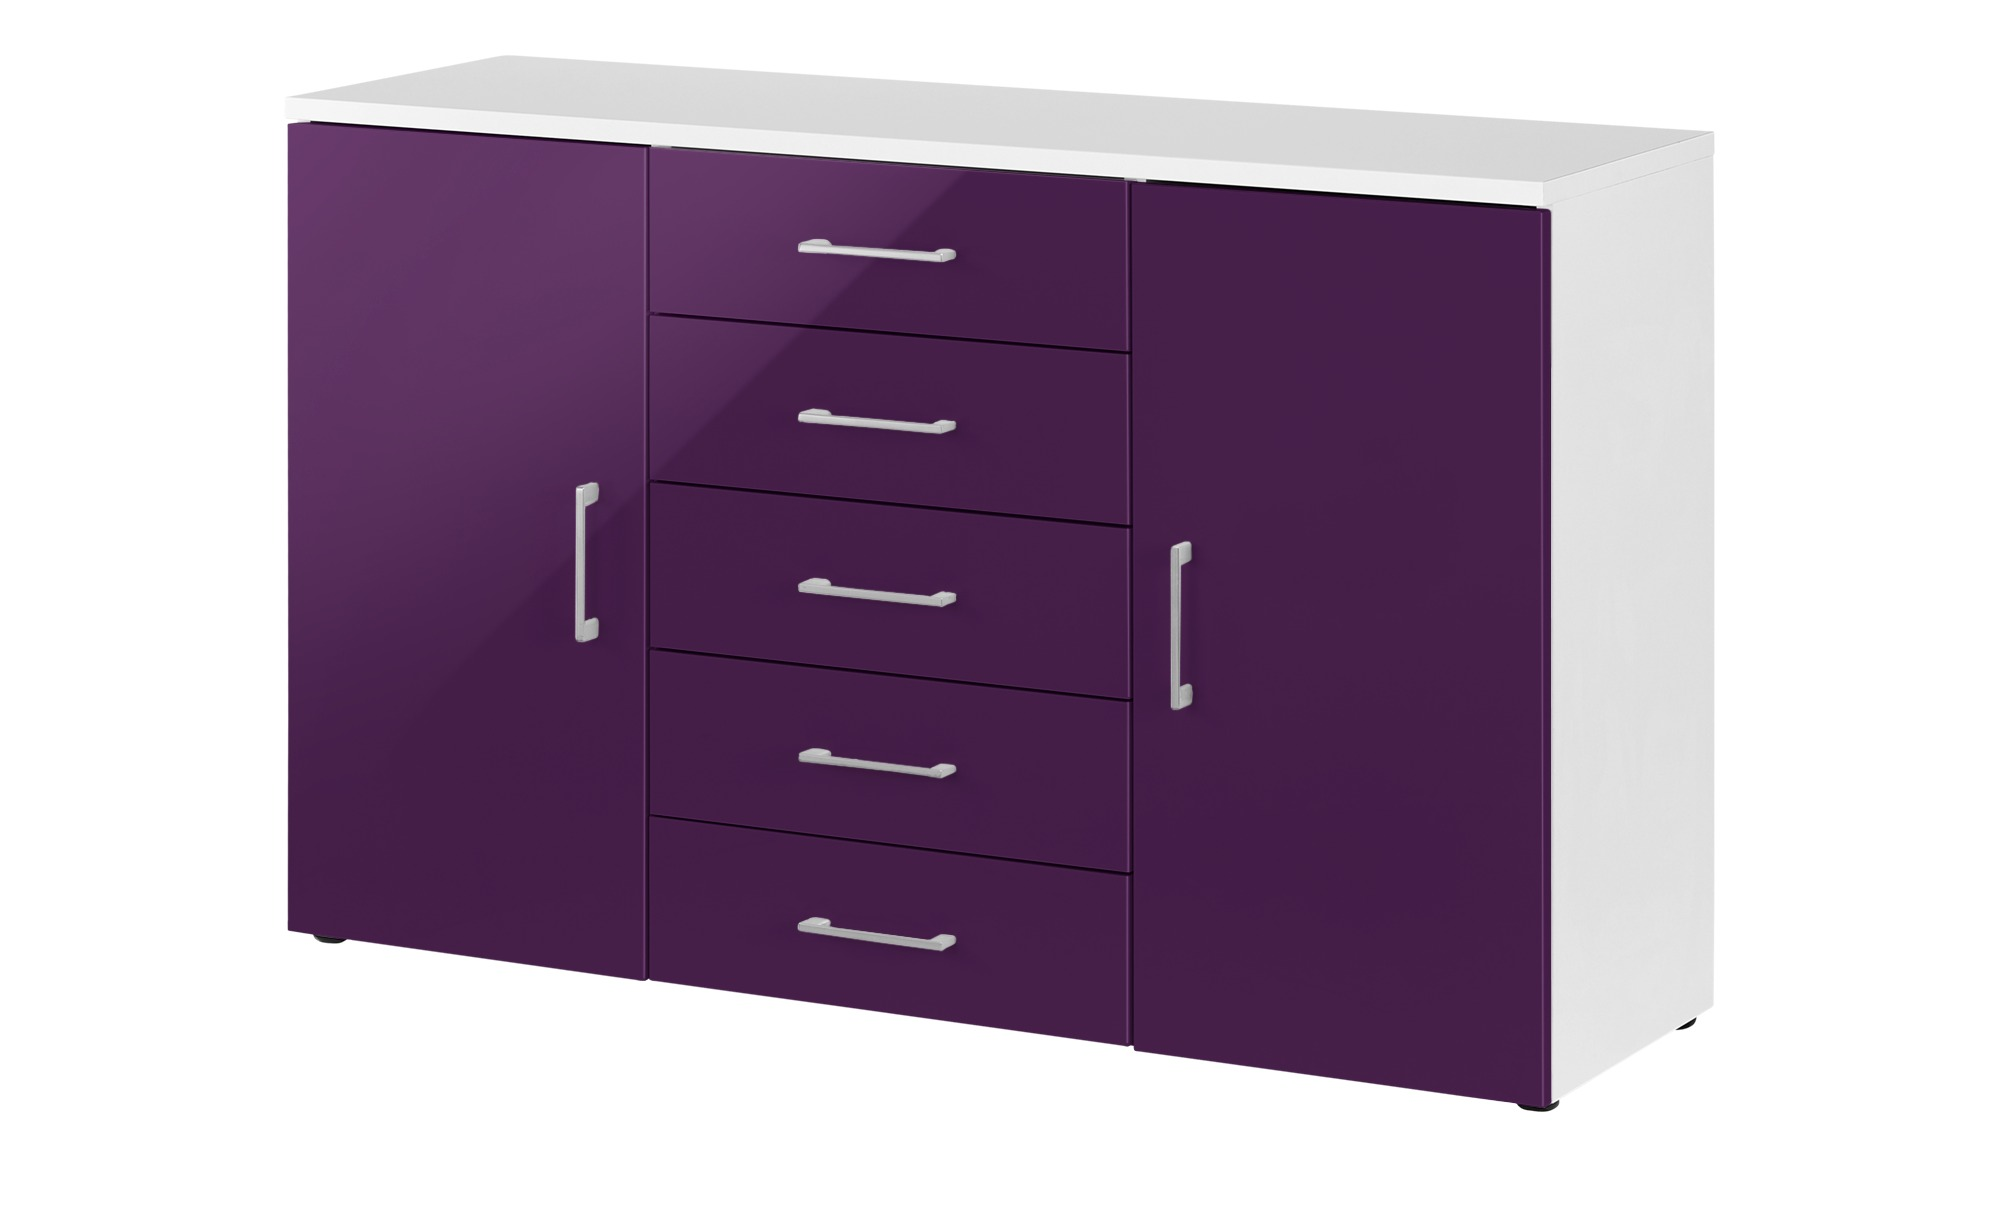 kombikommode colors breite 130 cm h he 84 cm lila. Black Bedroom Furniture Sets. Home Design Ideas